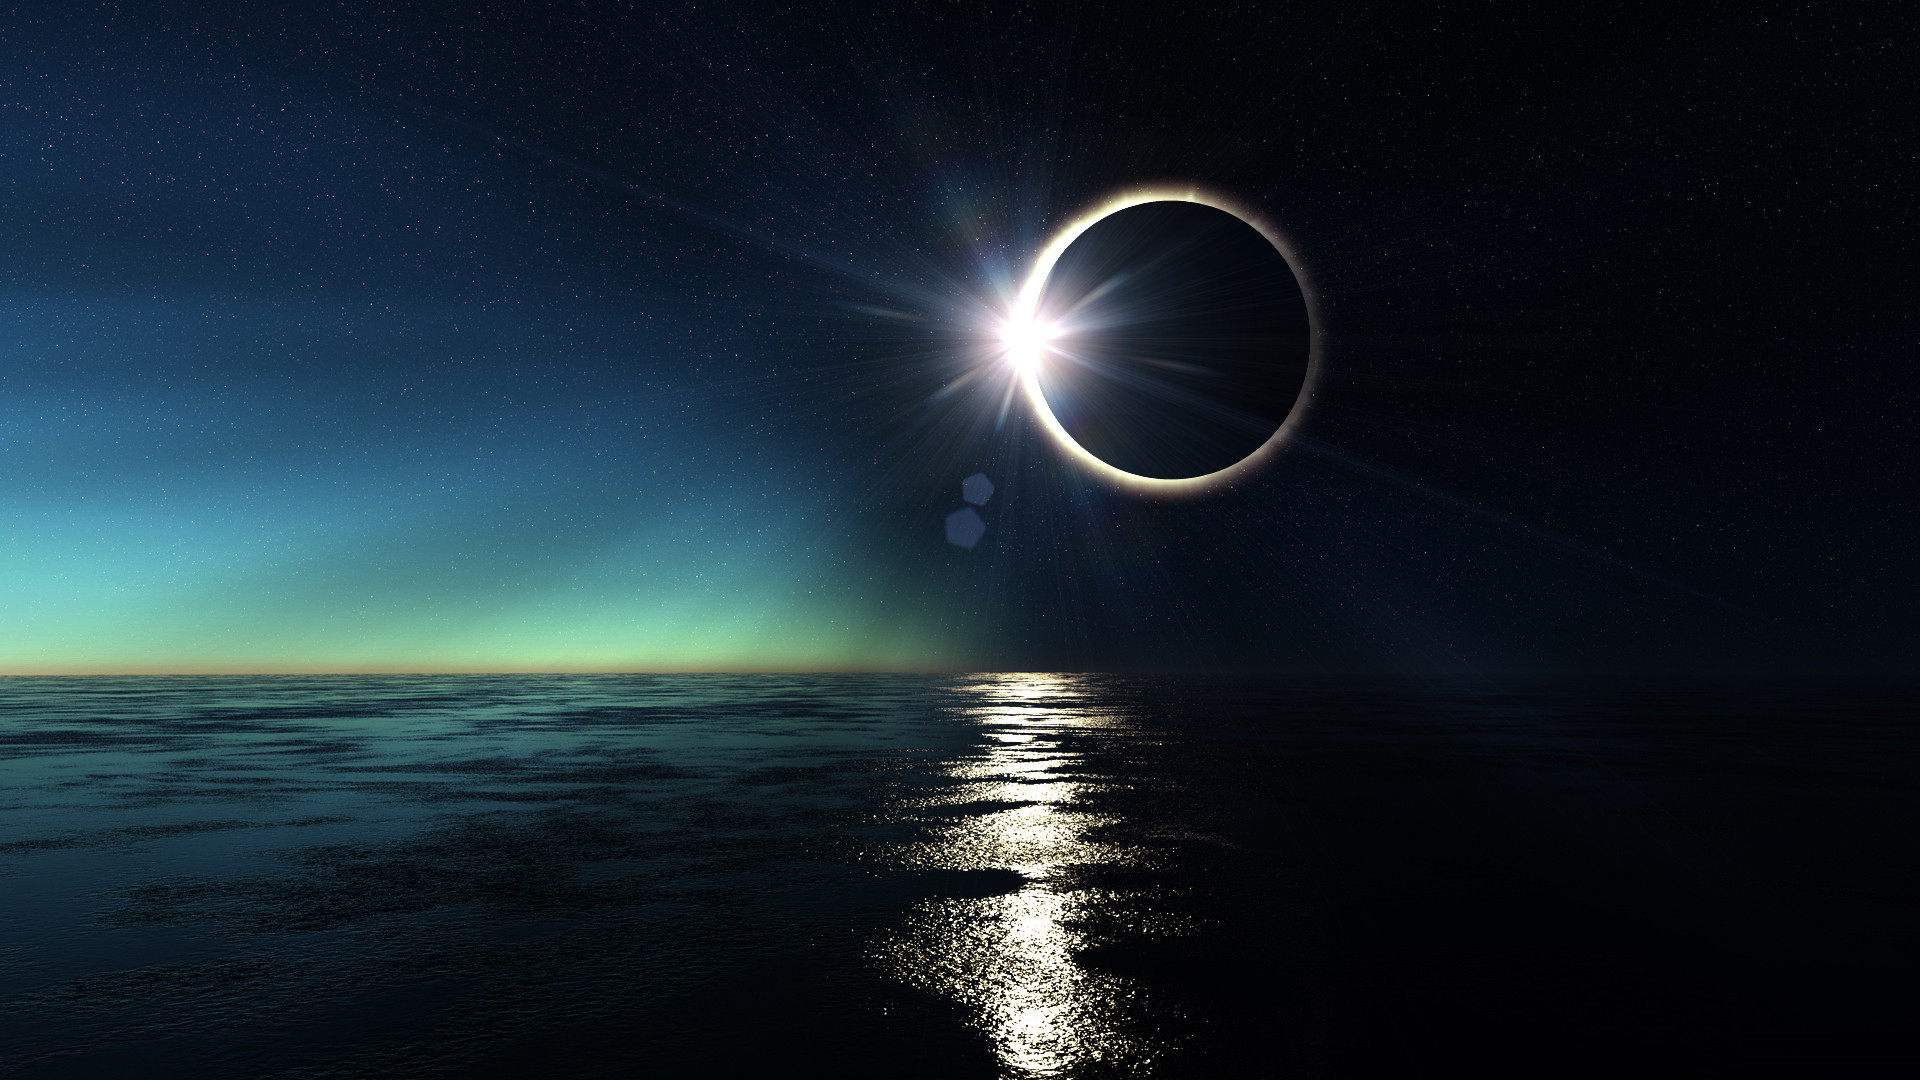 Free download Eclipse Wallpaper Hd ...